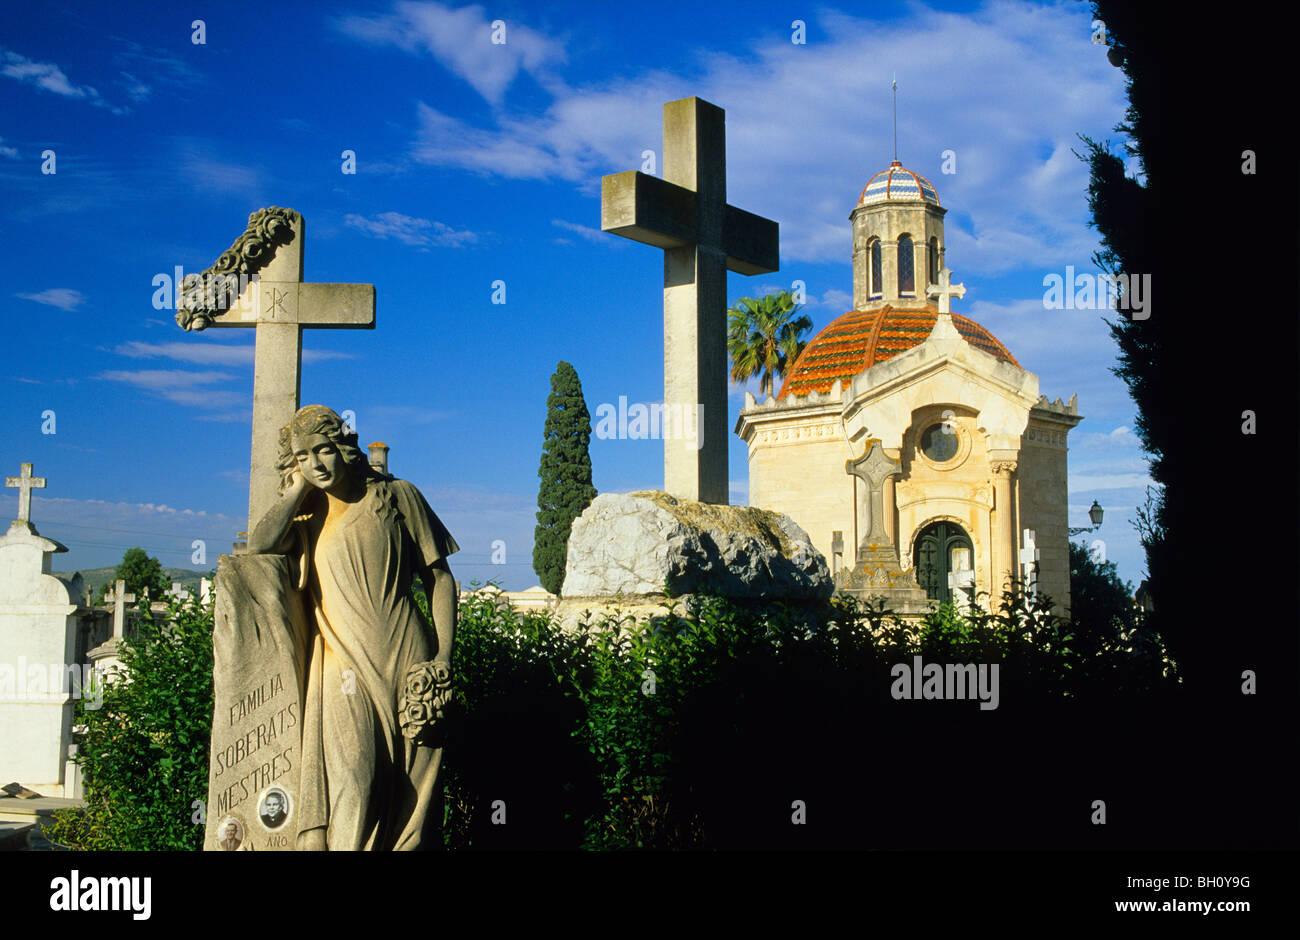 Europe, Spain, Majorca, Sa Pobla. Graveyard - Stock Image